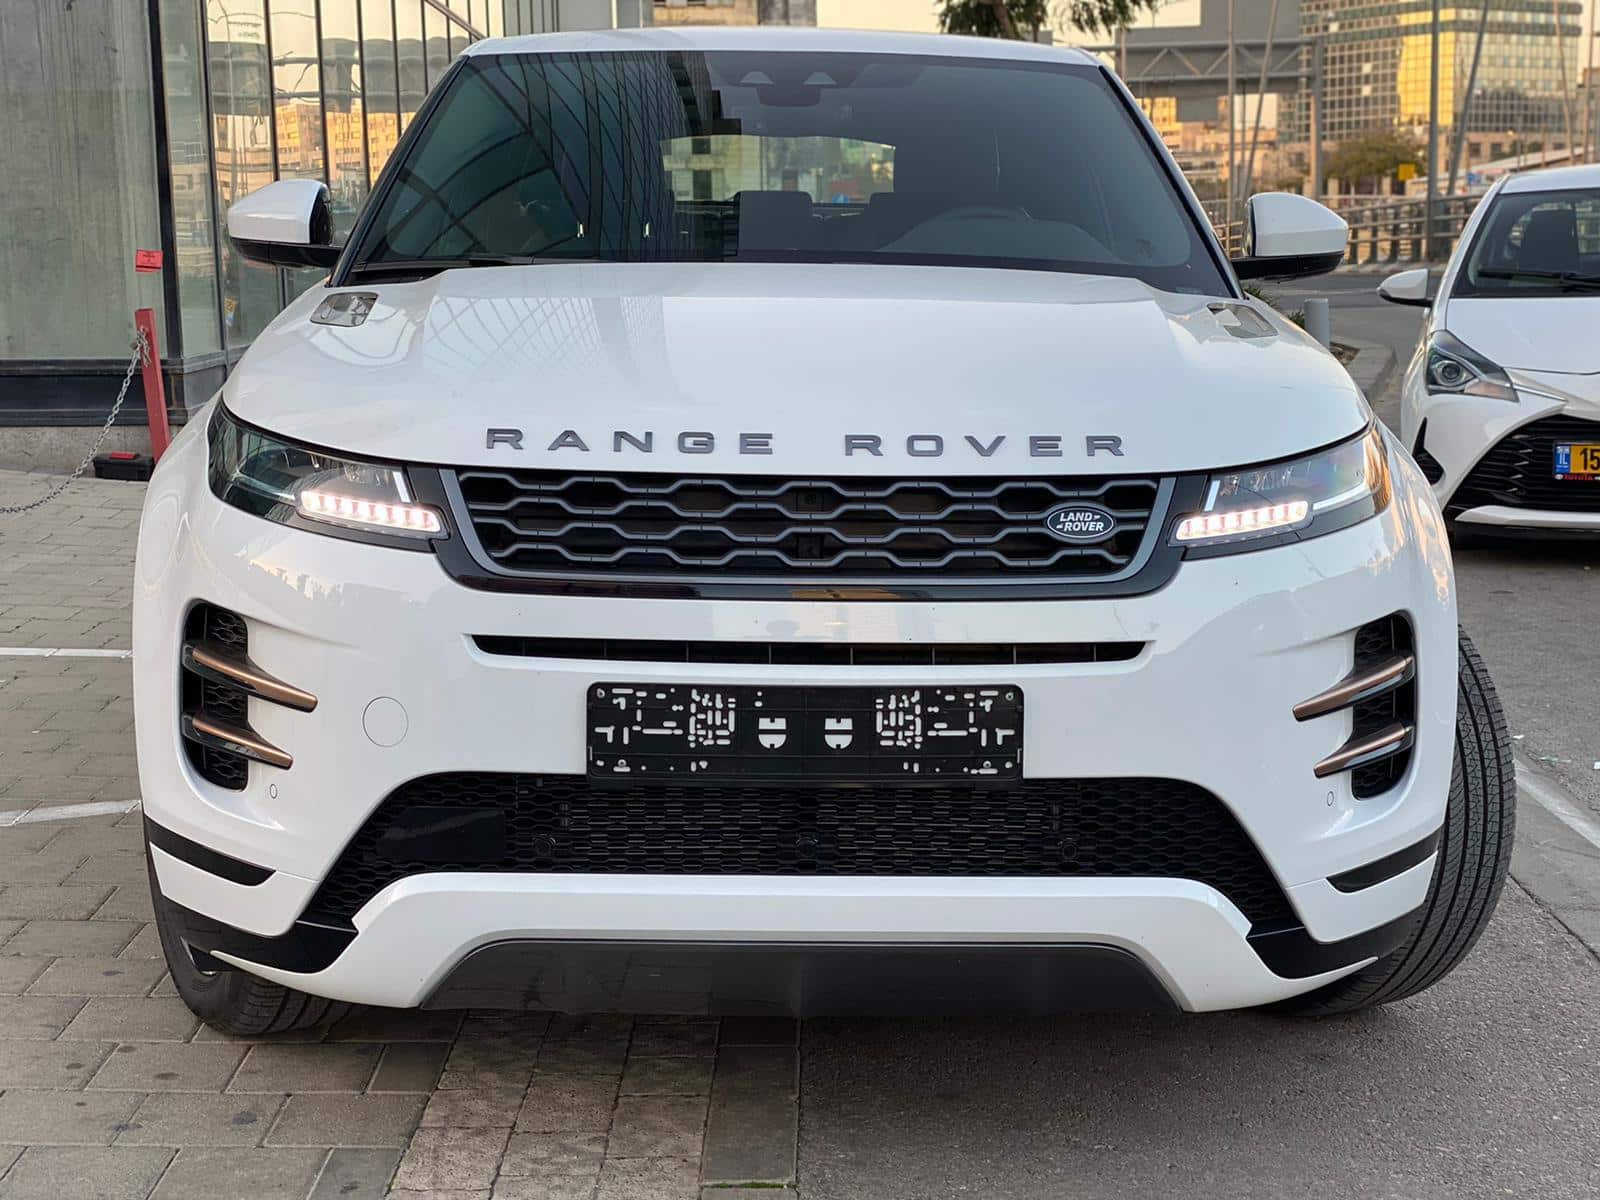 RANGE ROVER ריינג' רובר תמונת הגה גריל רכב